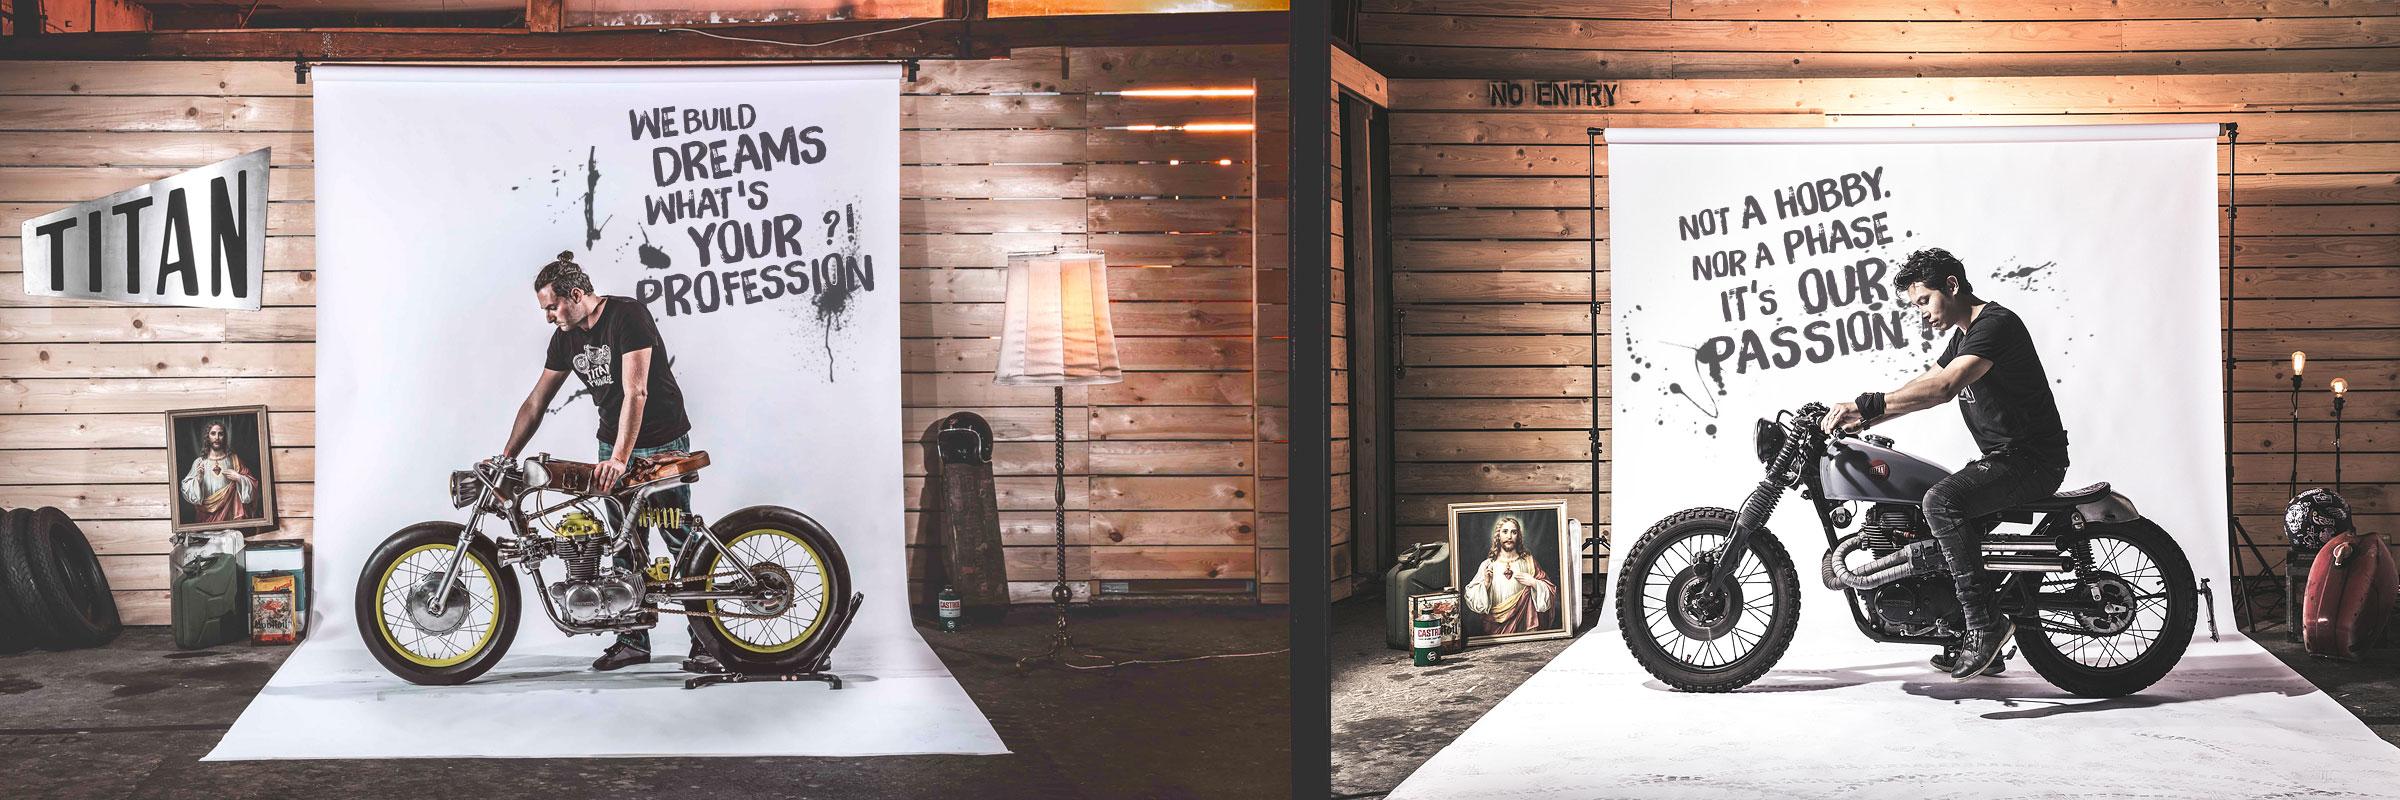 Titan-Cafe-Racer-Shop-Garage-Lifestyle-Fashion-Style-Custom-Art-Helmet-Unique-Design-Michael-Siebenhofer-Thanh-Ho-Ngo-Shenfu-Graz